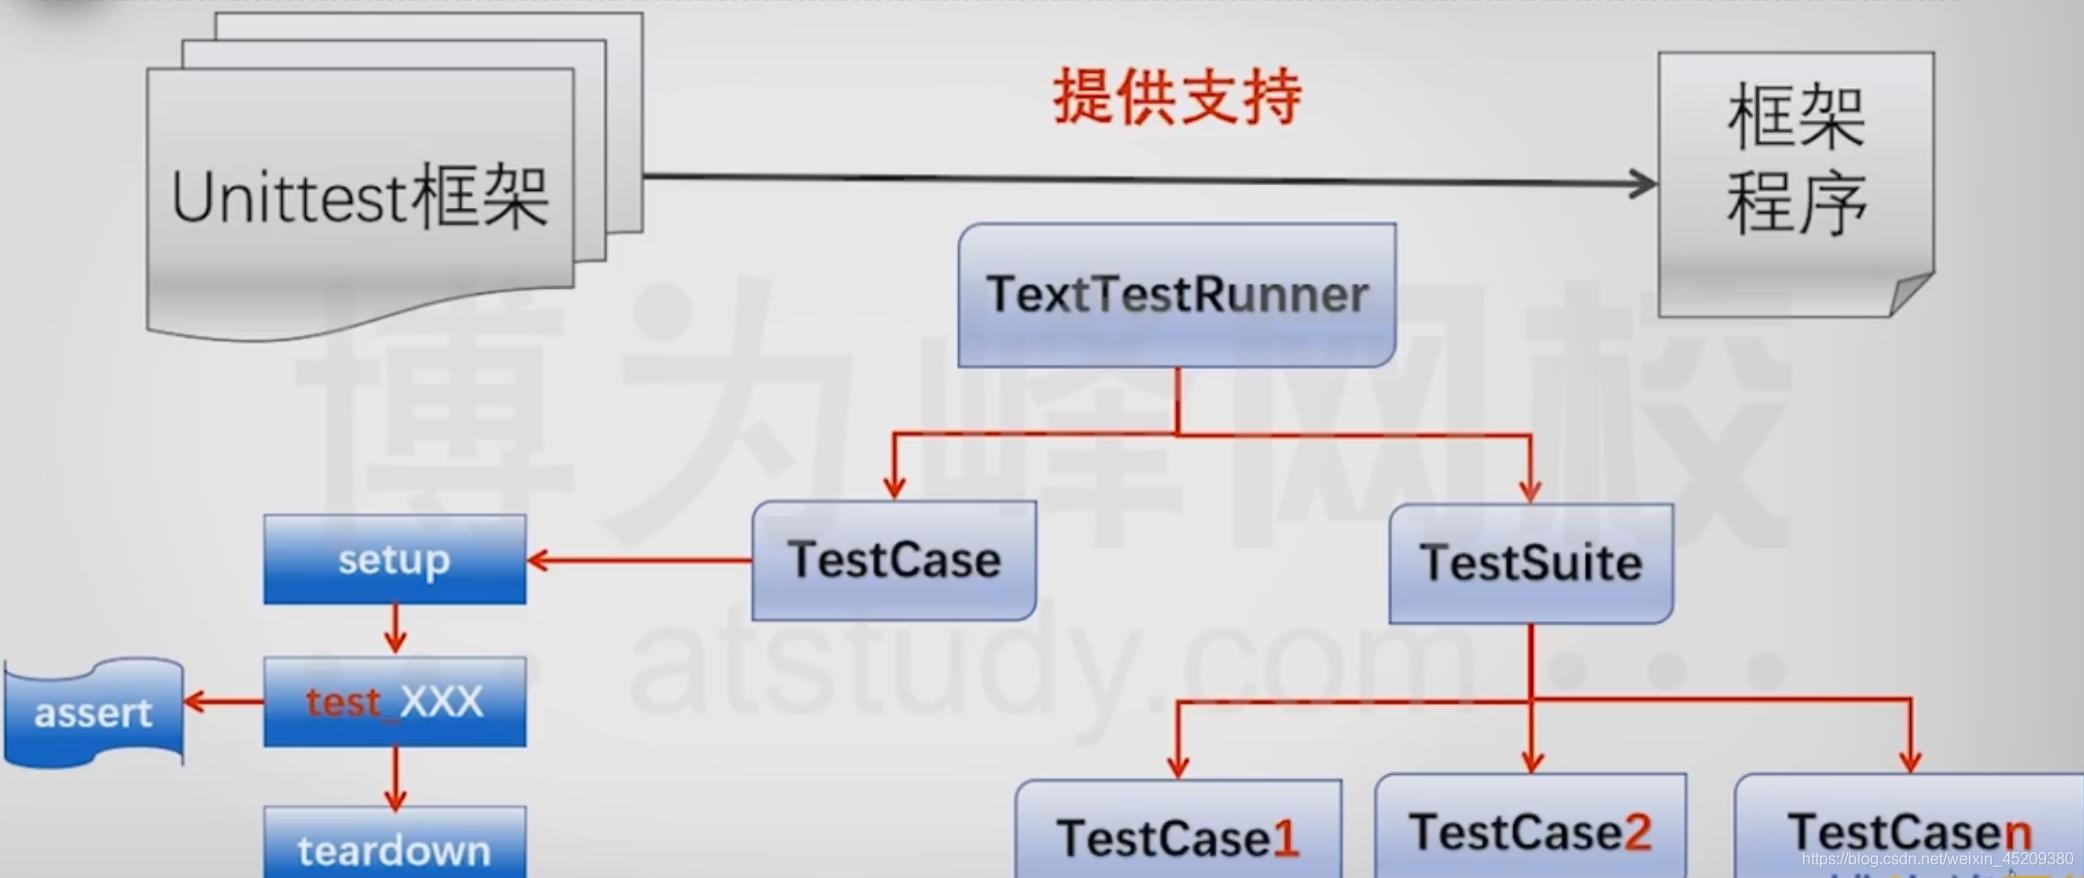 Unittest框架设计原理